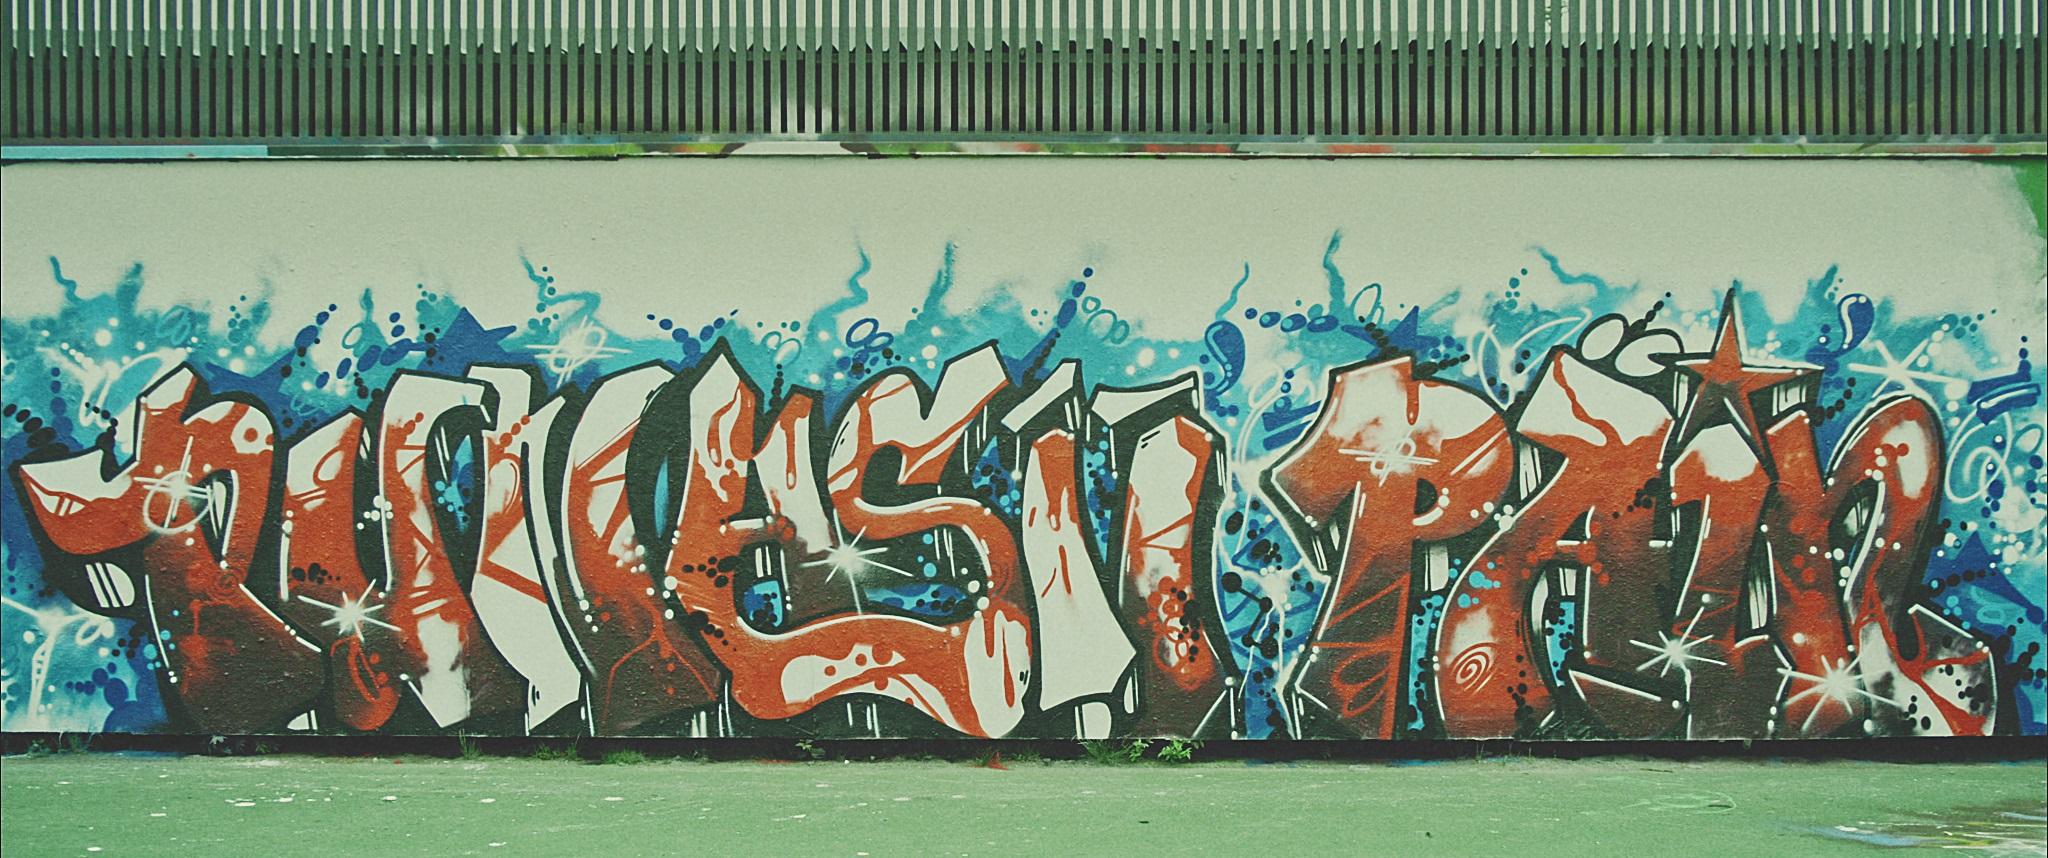 ppgraffiti.jpg